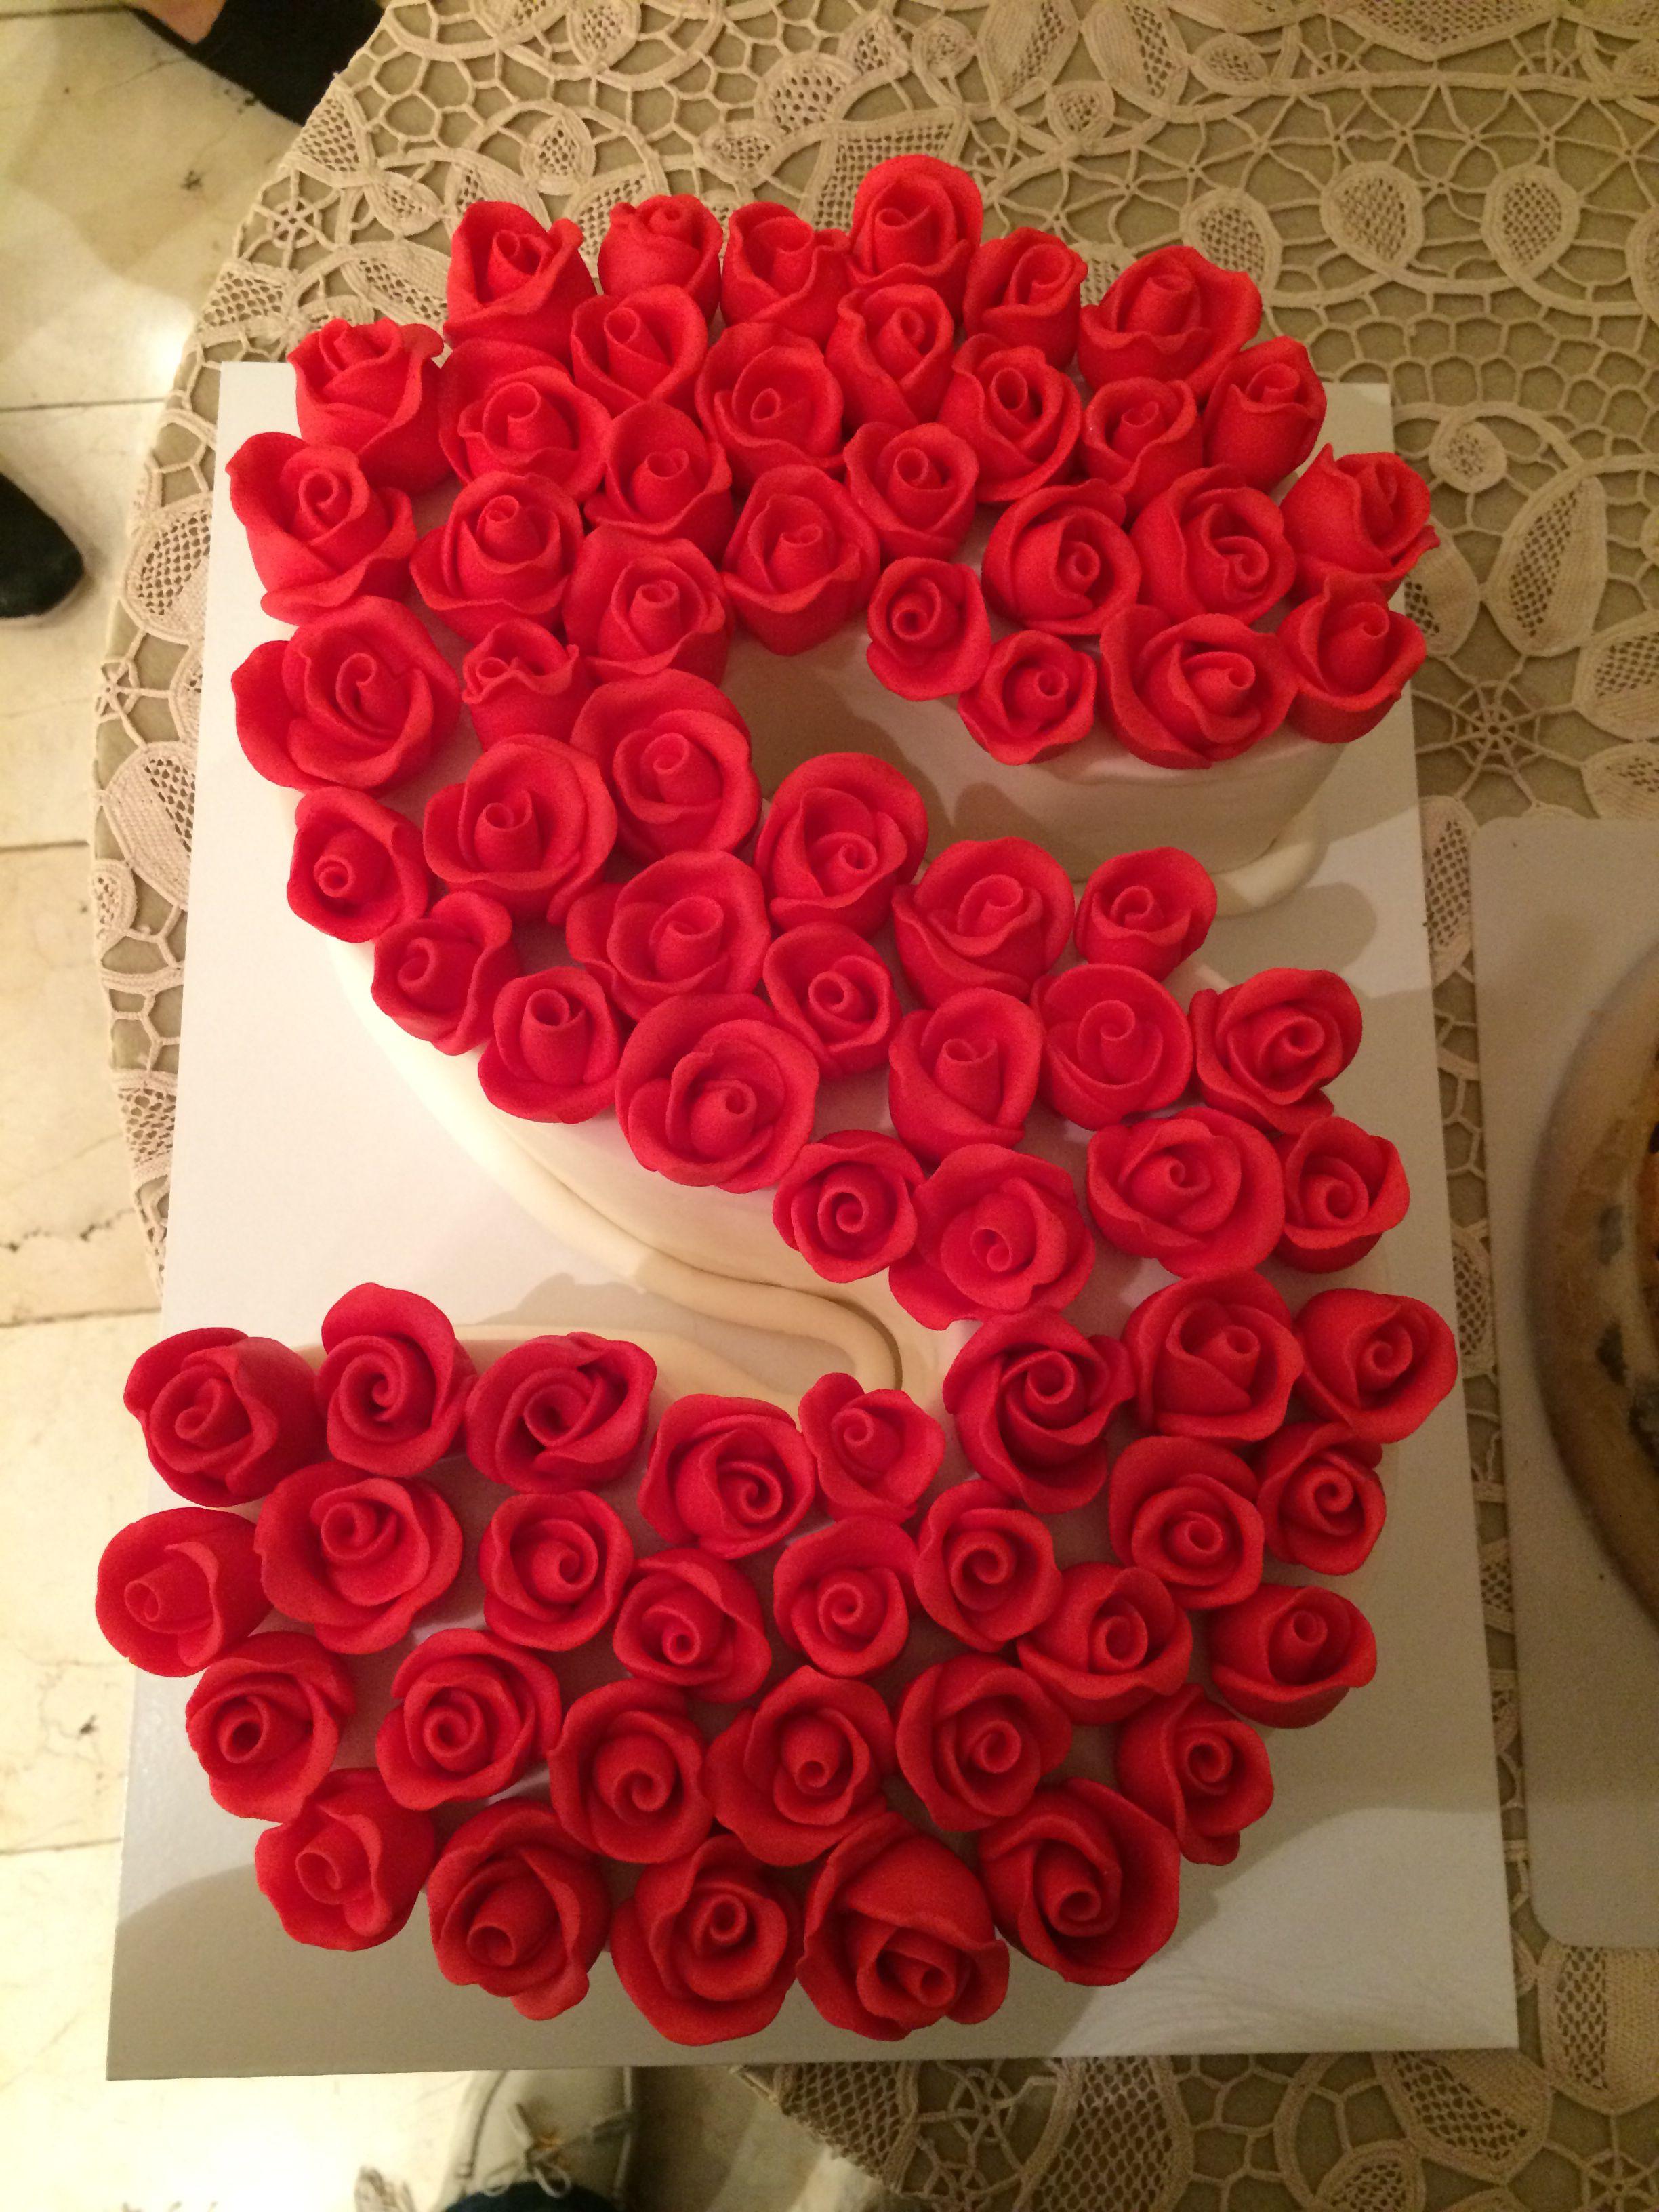 Upohar2mesend Gift To Bangladesh Online Cake Flower Gifts